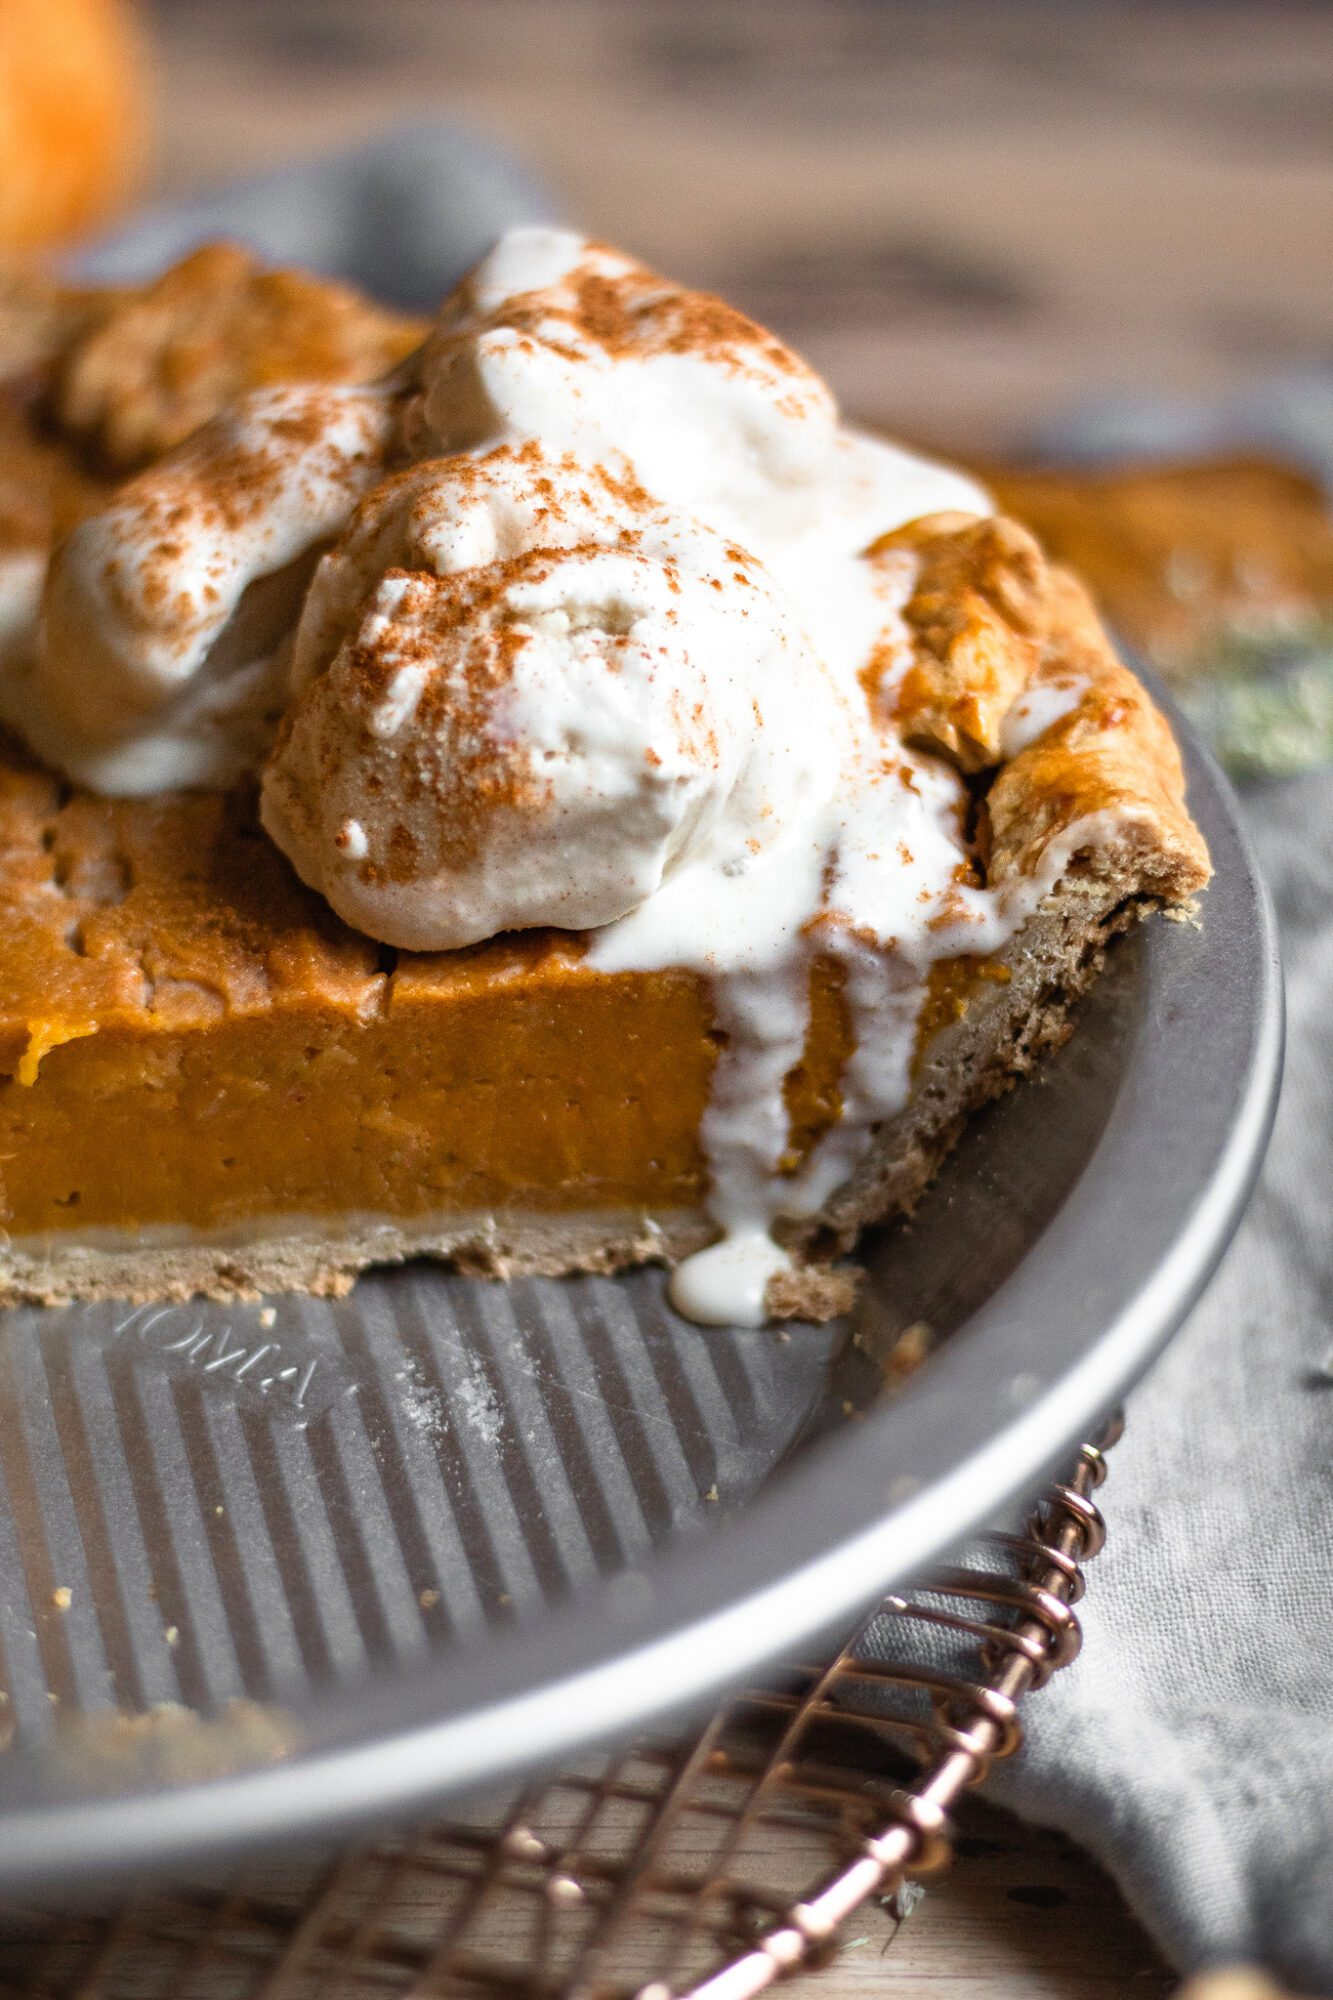 melting ice cream on sweet potato pie